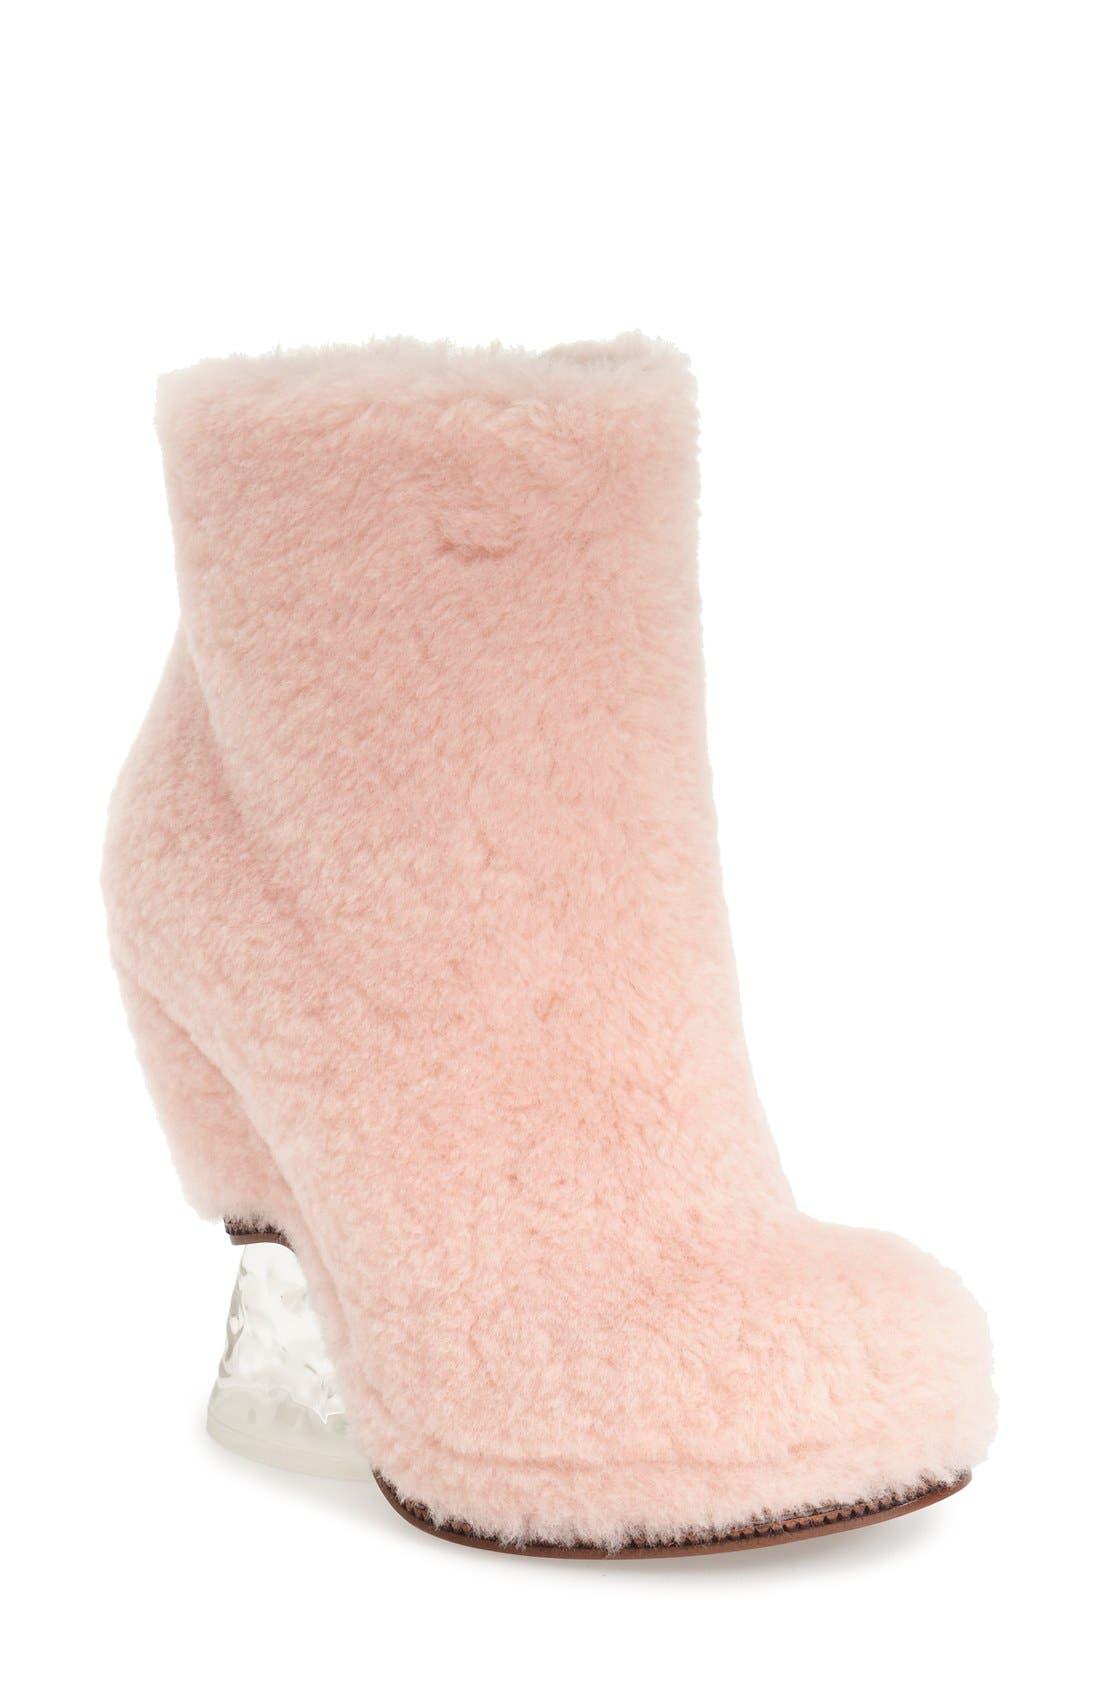 Main Image - FendiGenuineShearling Ankle Bootie (Women)